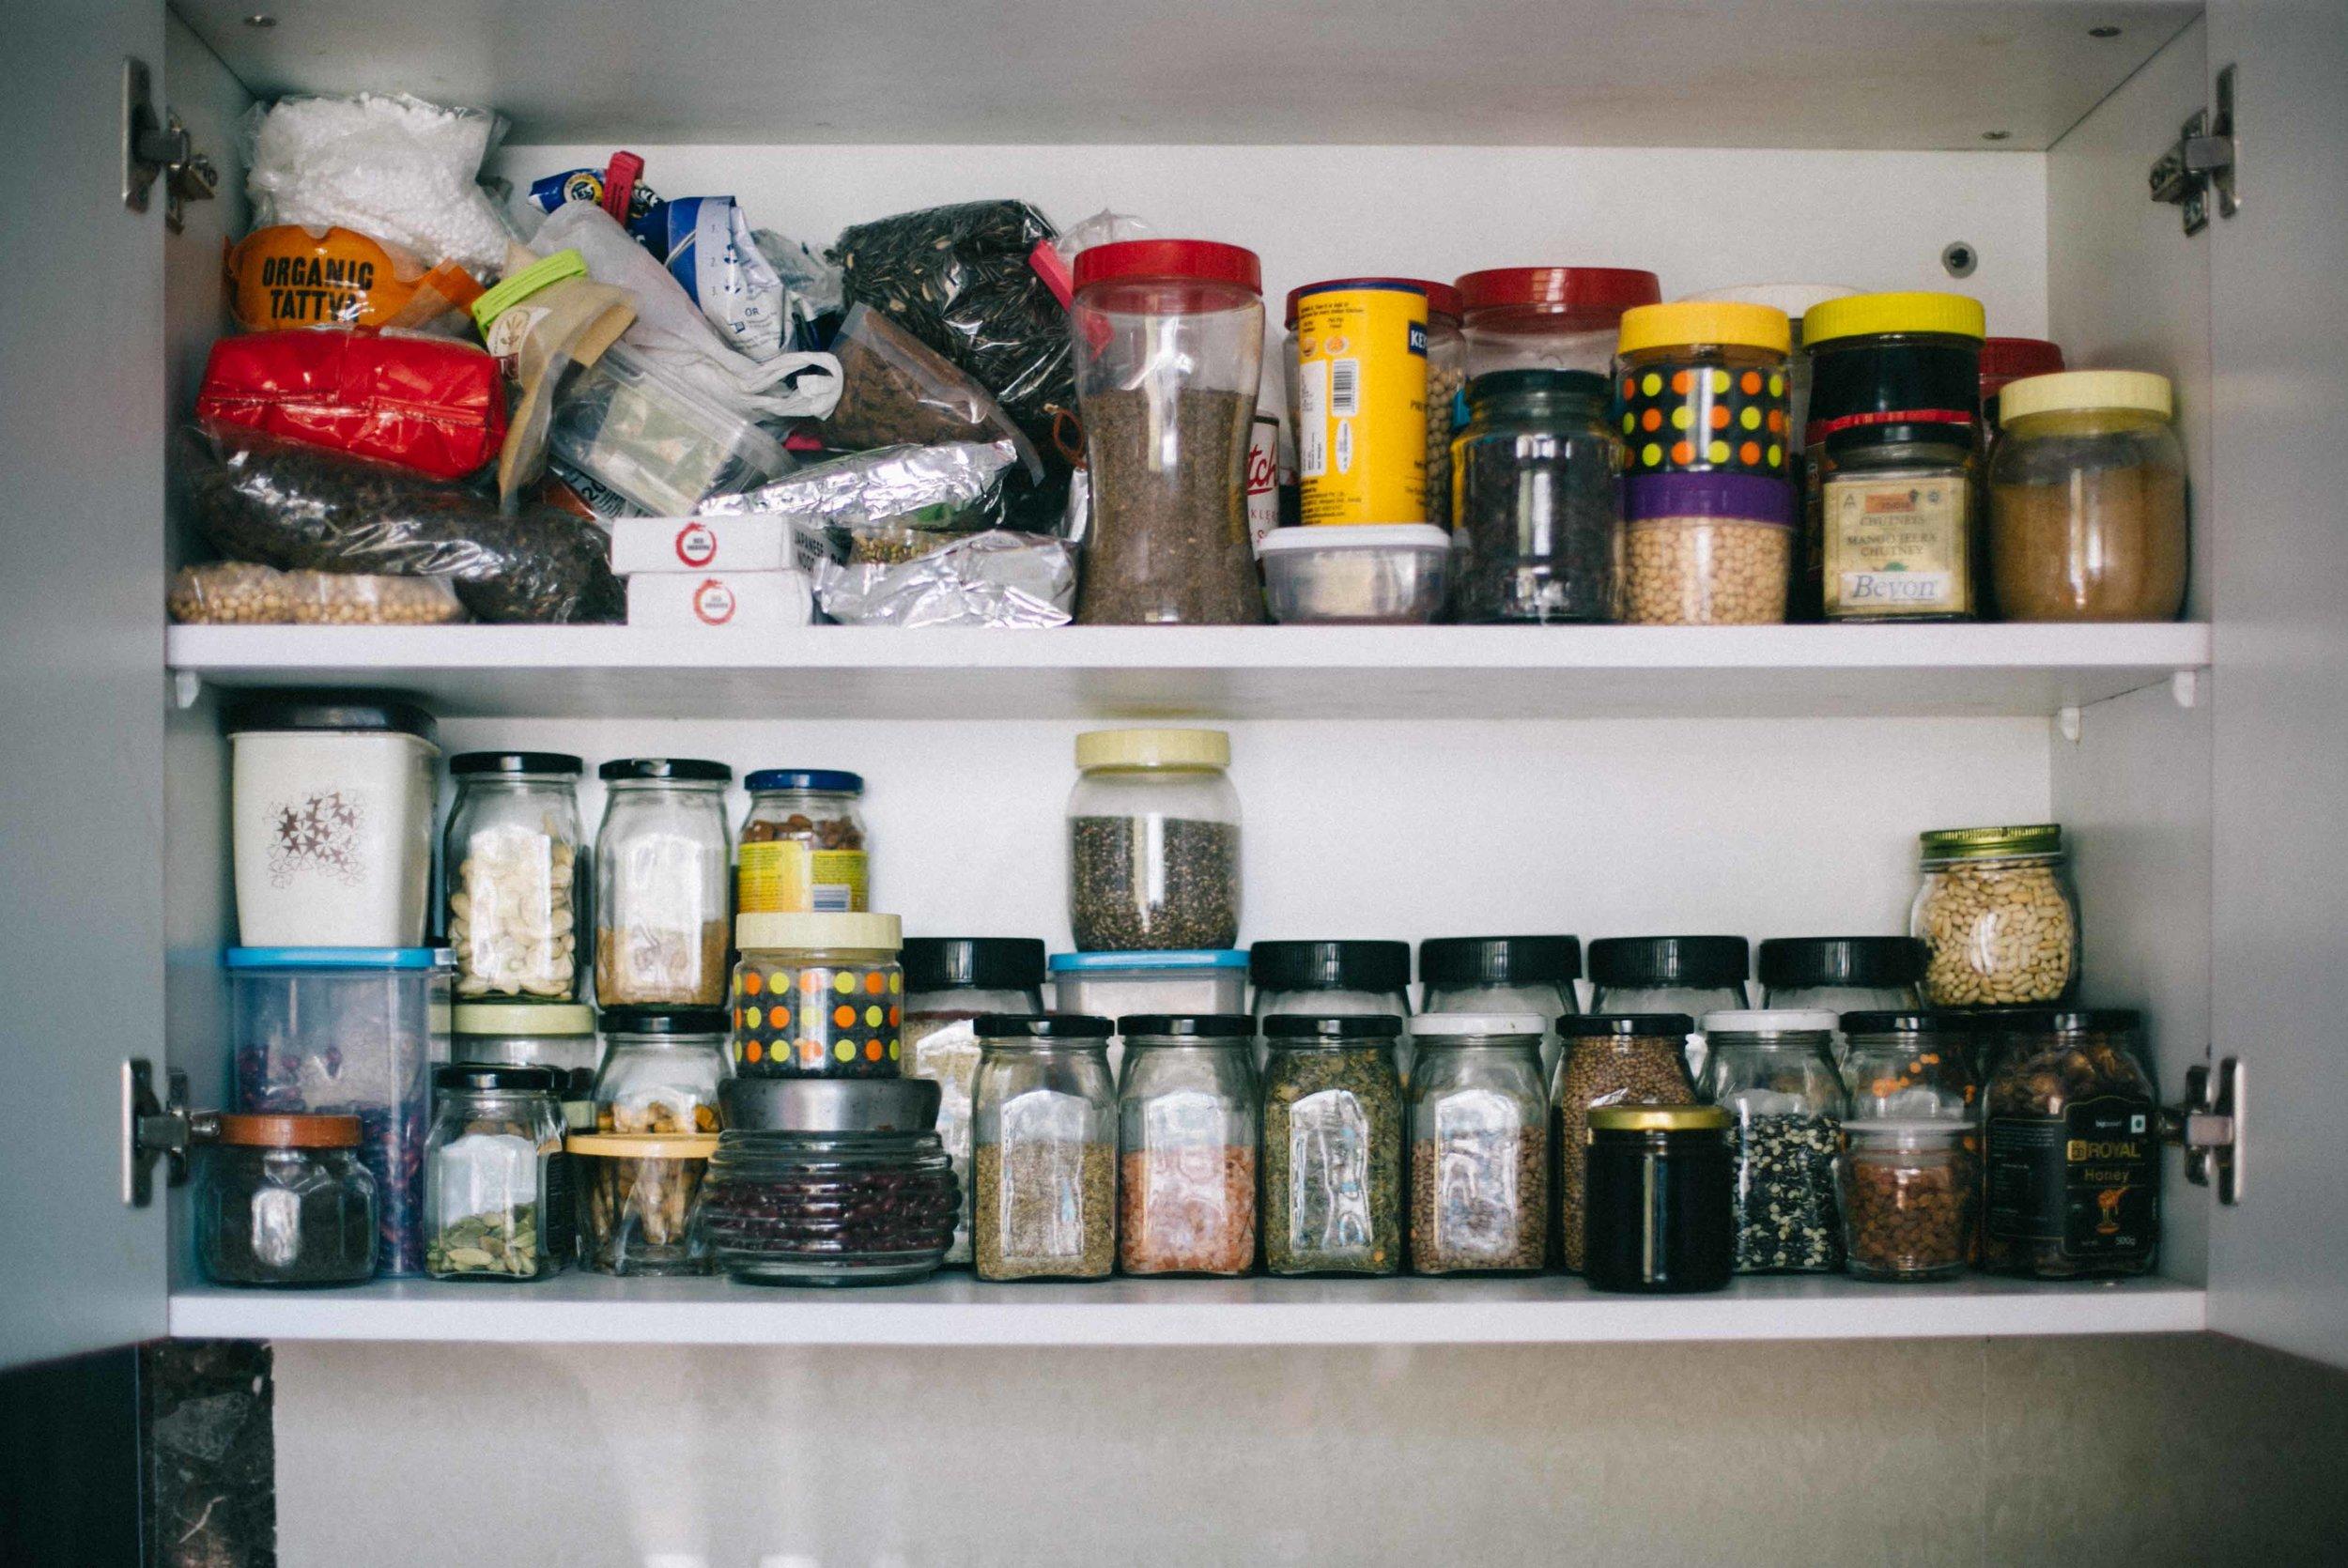 pooja 1000 kitchens